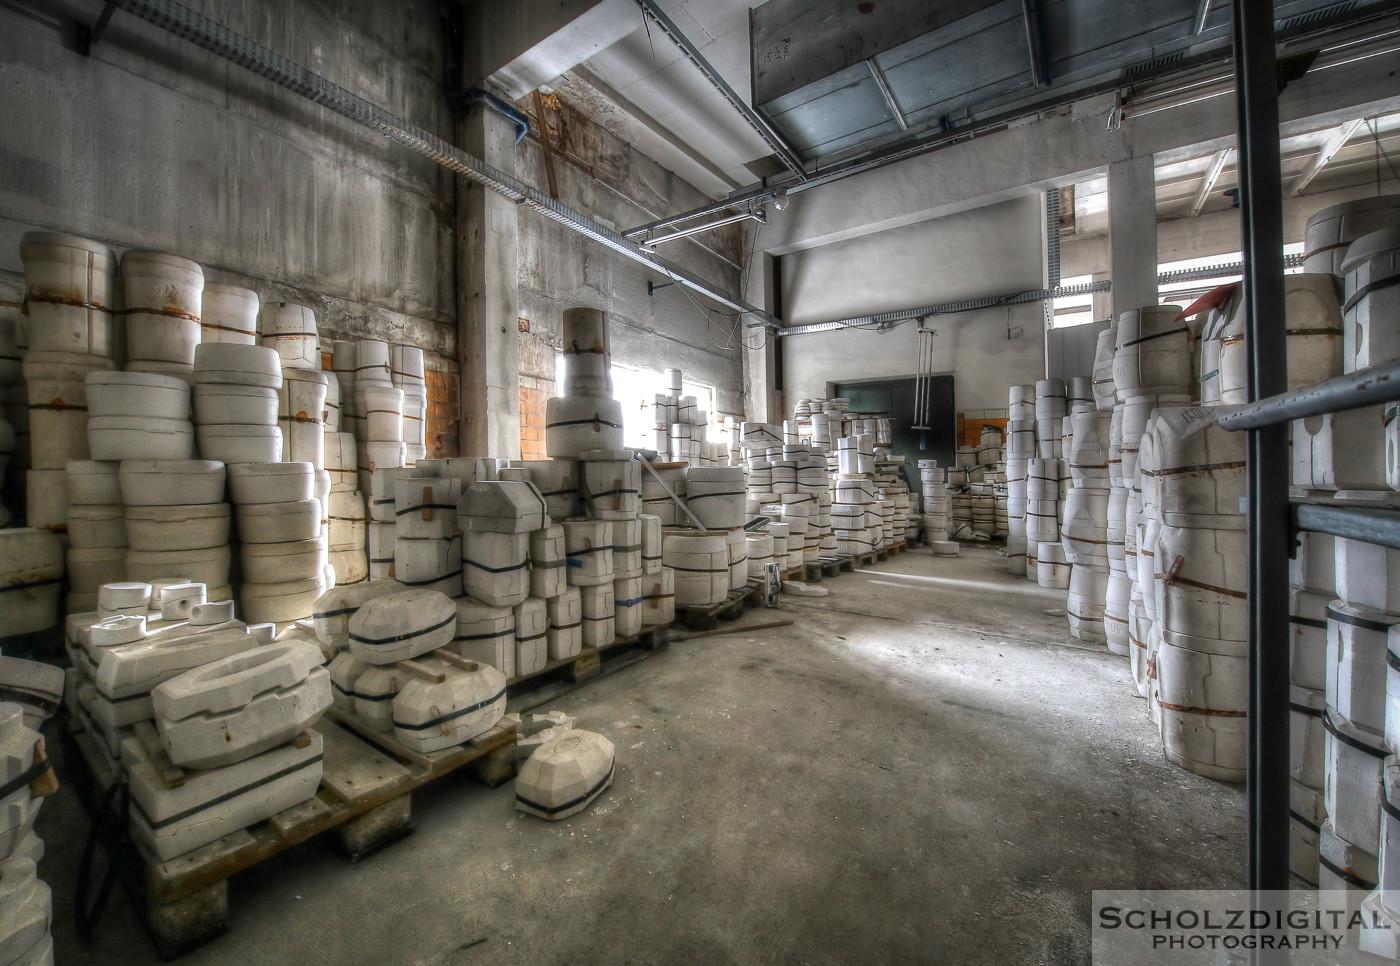 Urbex, Lost Place, HDR, Abandoned, verlassene Orte, verlassen, verlaten, Urban exploration, UE, Verlassene Orte in Deutschland, Porzellanfabrik Pottery,